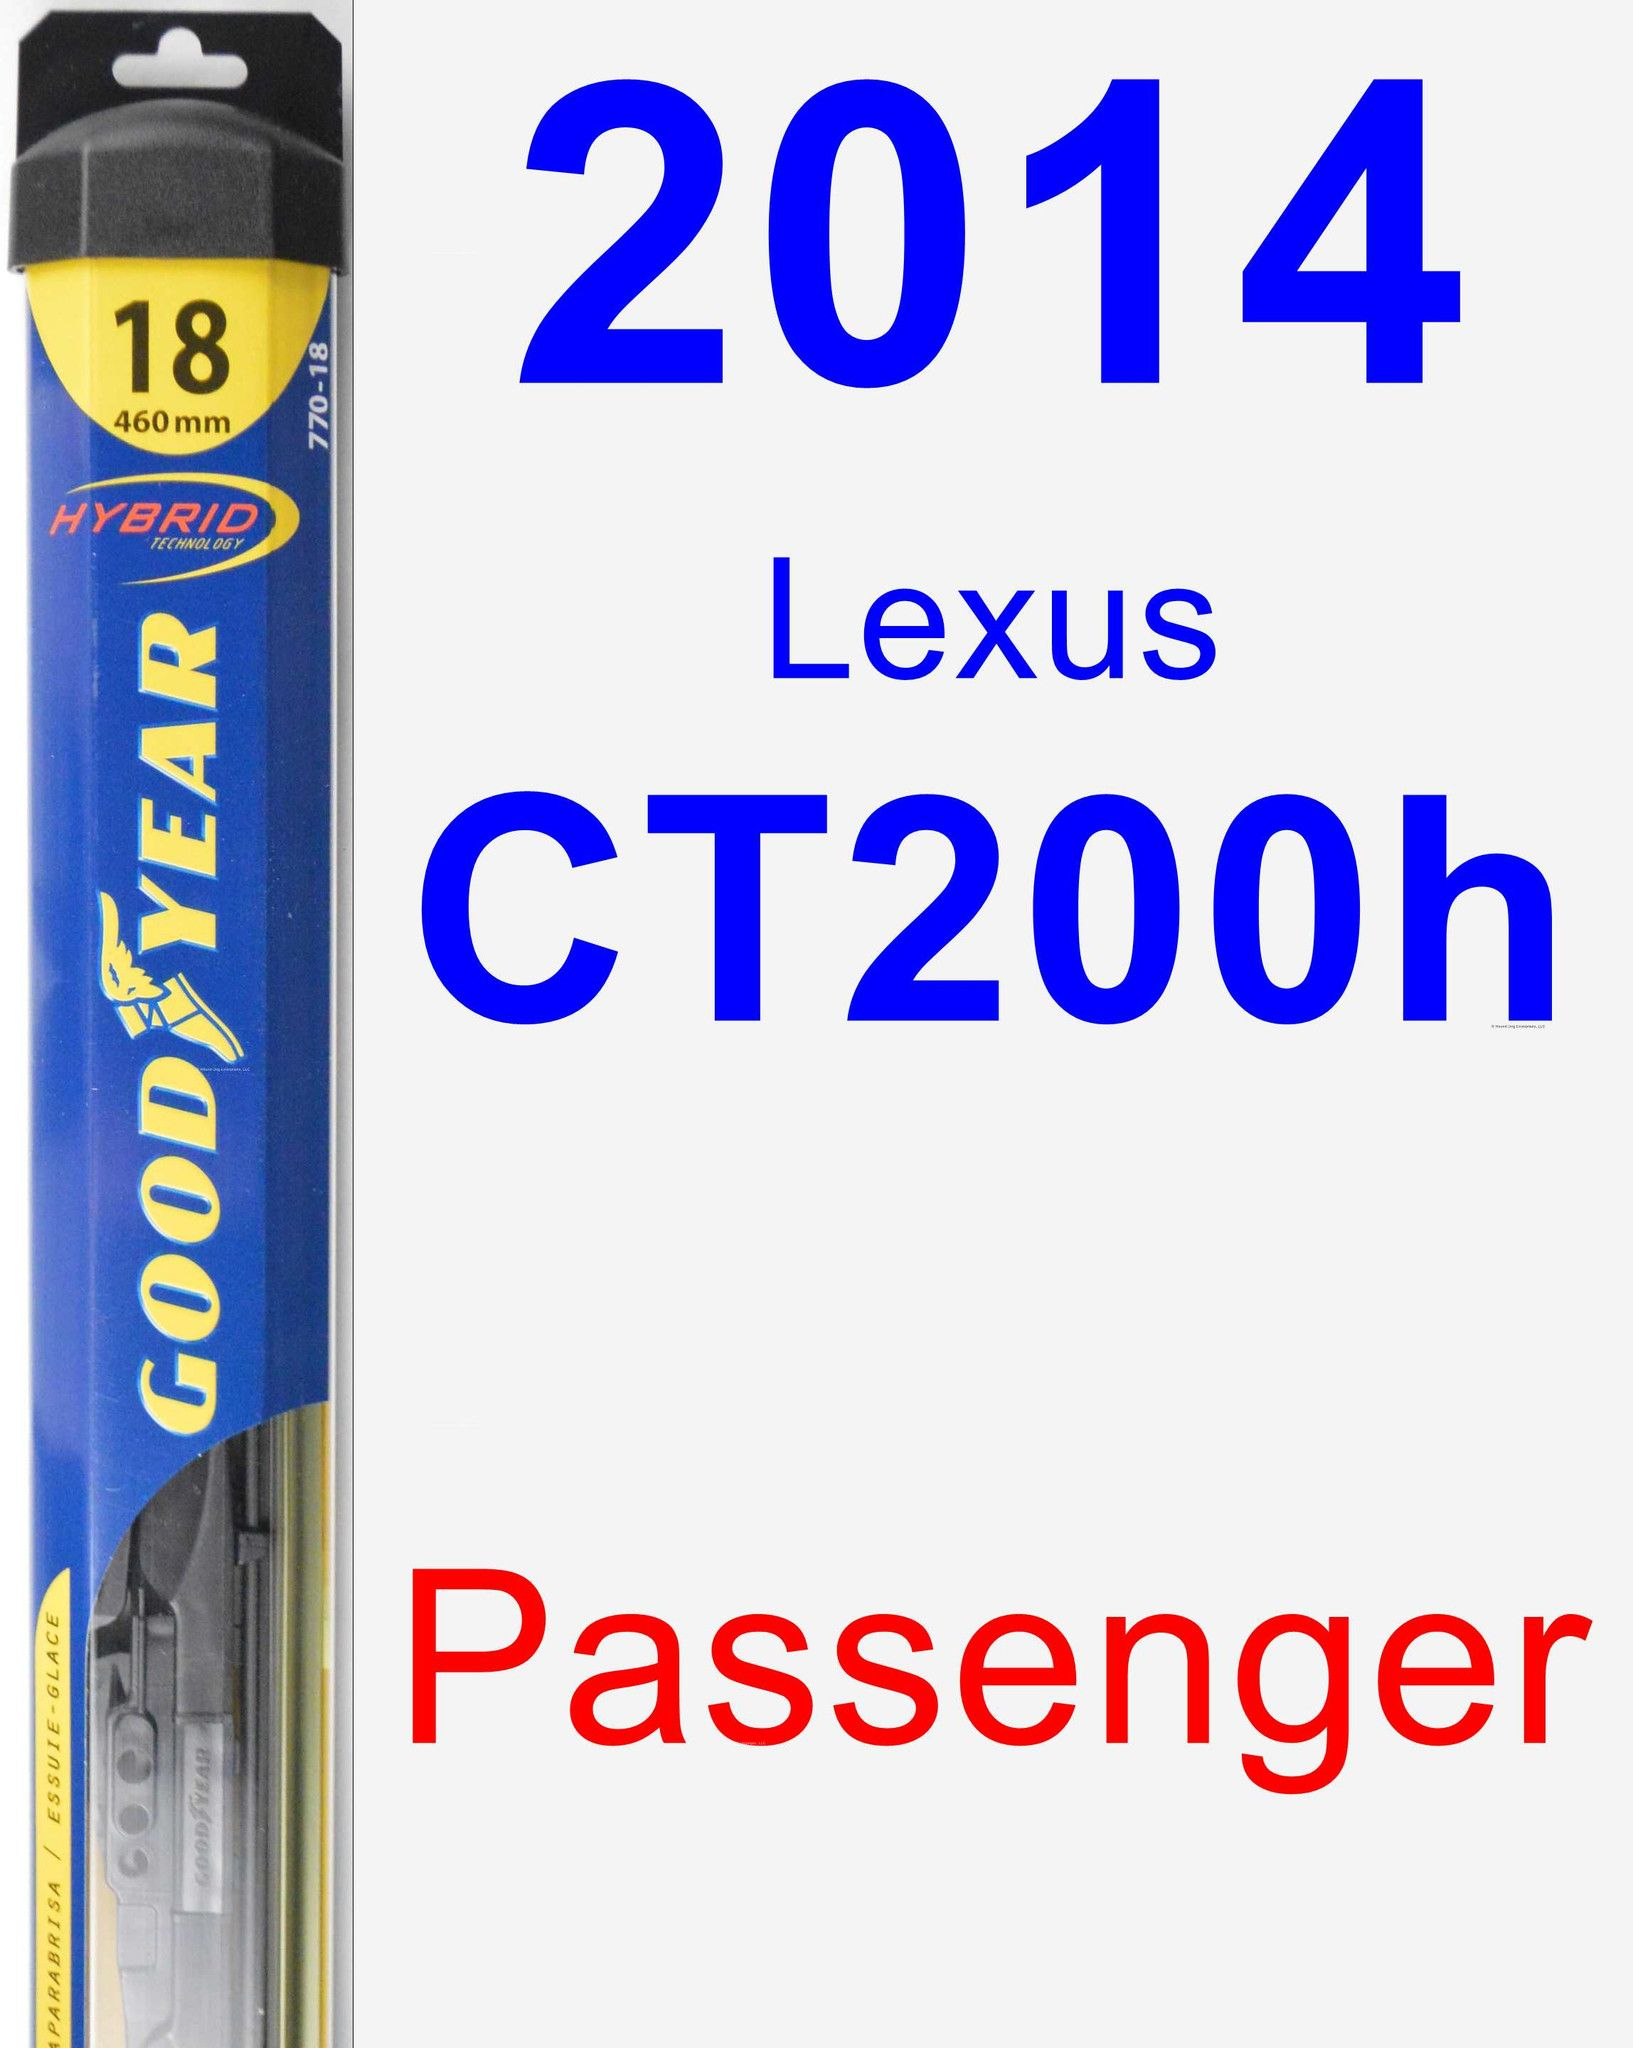 Passenger Wiper Blade For 2014 Lexus Ct200h Hybrid Wiring Diagram